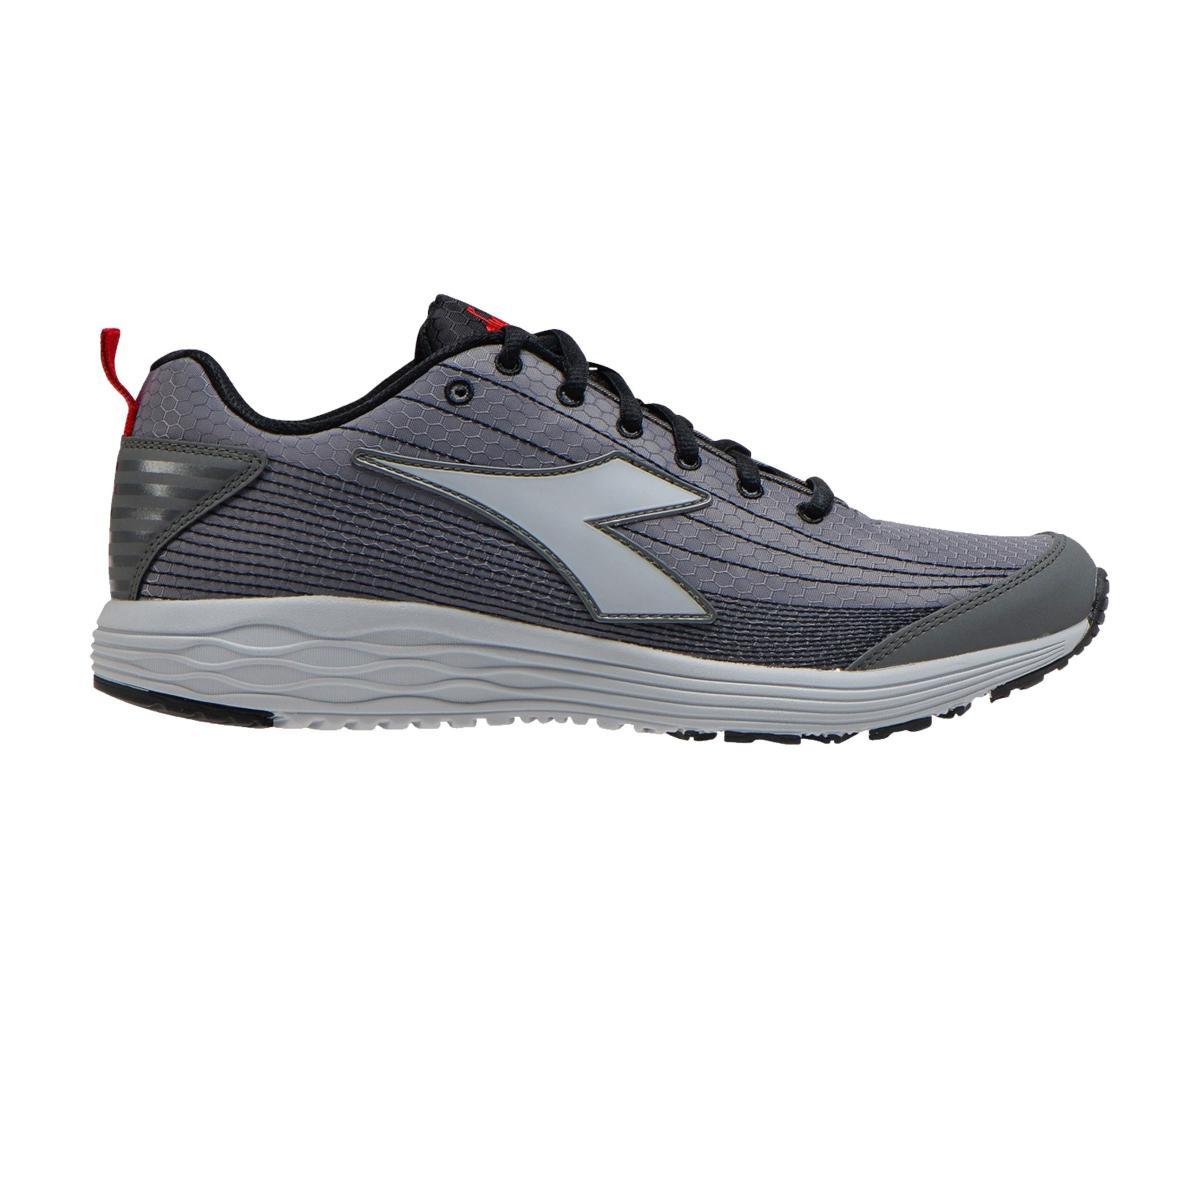 Scarpe Sneakers Diadora Flamingo 4 Win da uomo rif. 101.178893 01